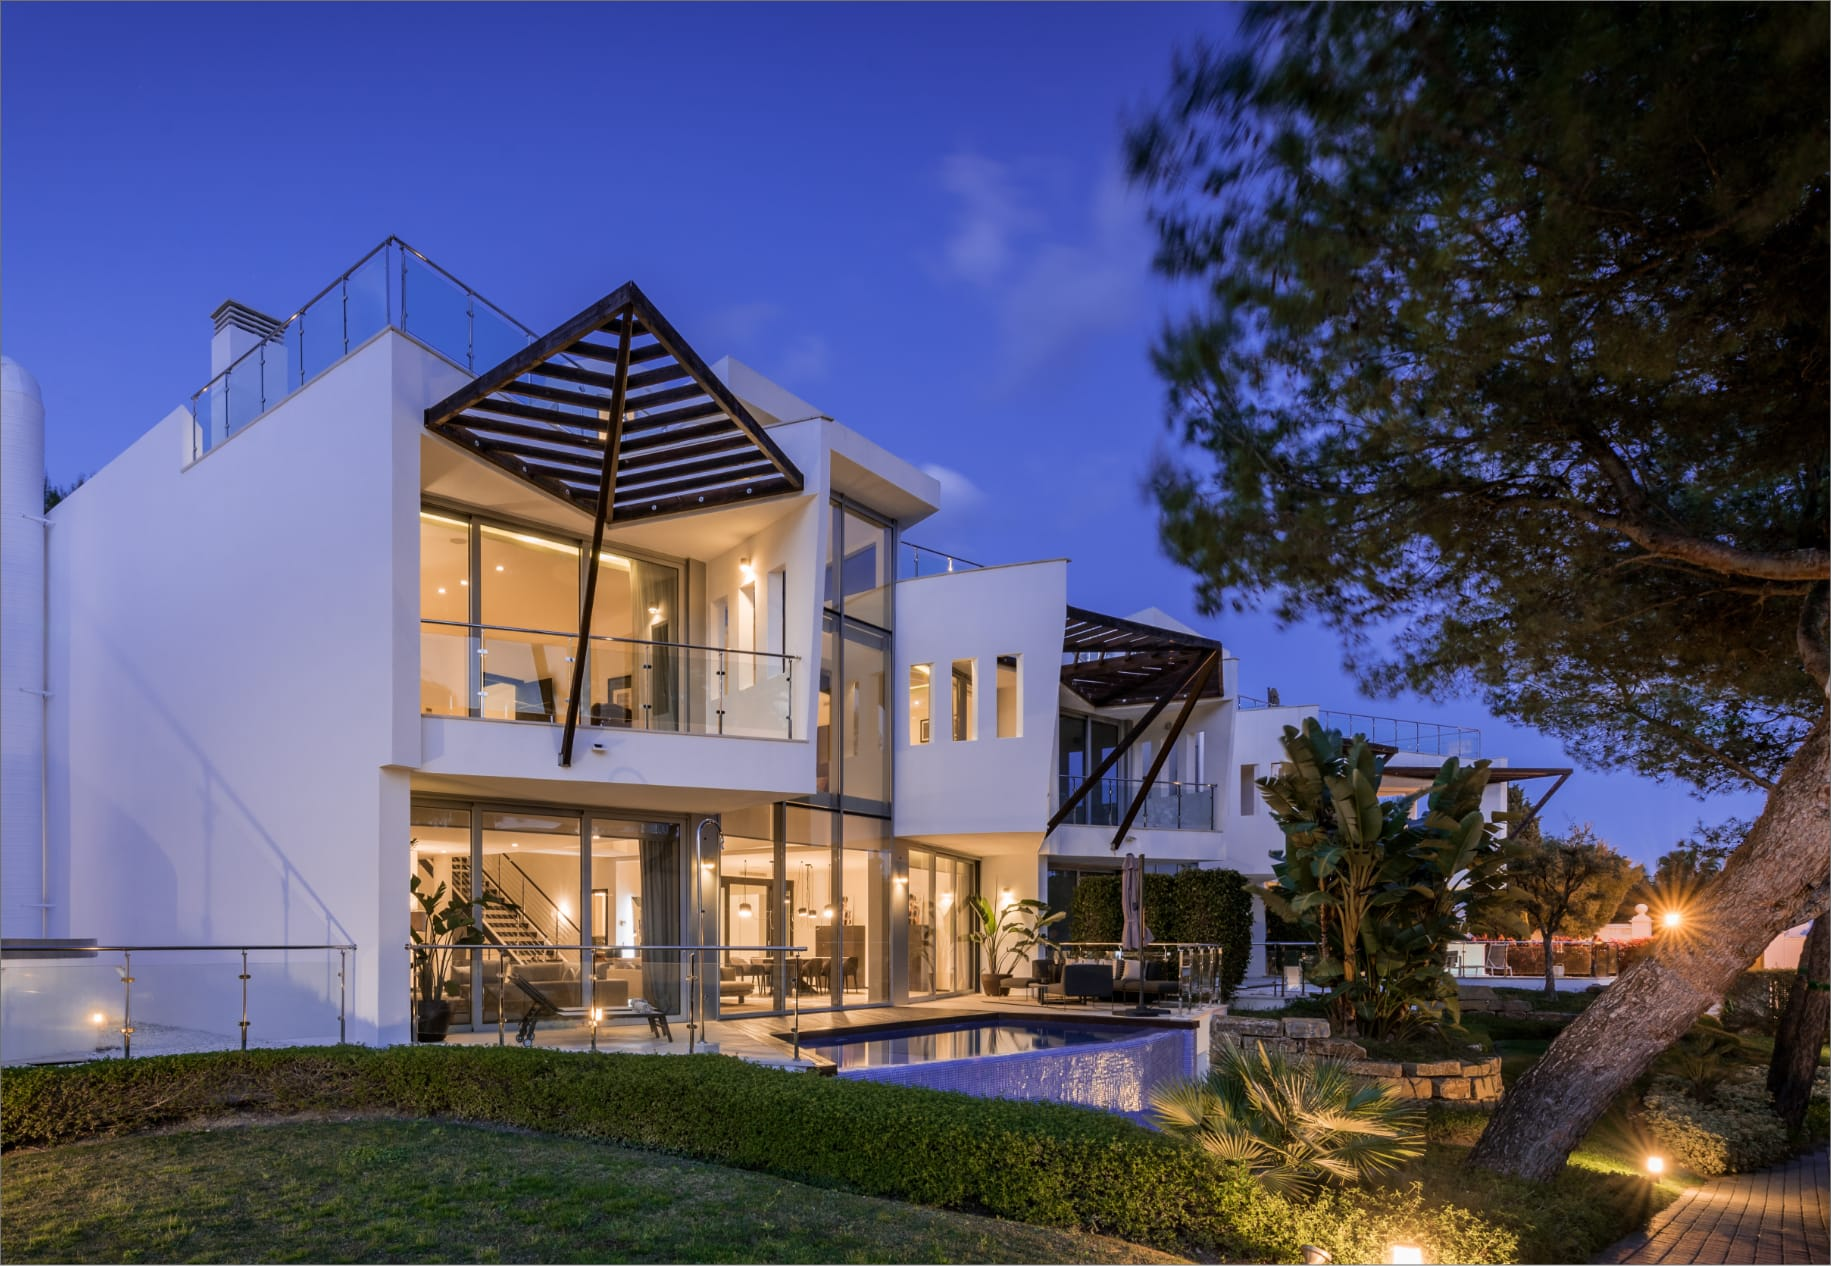 359-00177P: Semi detached house in Marbella